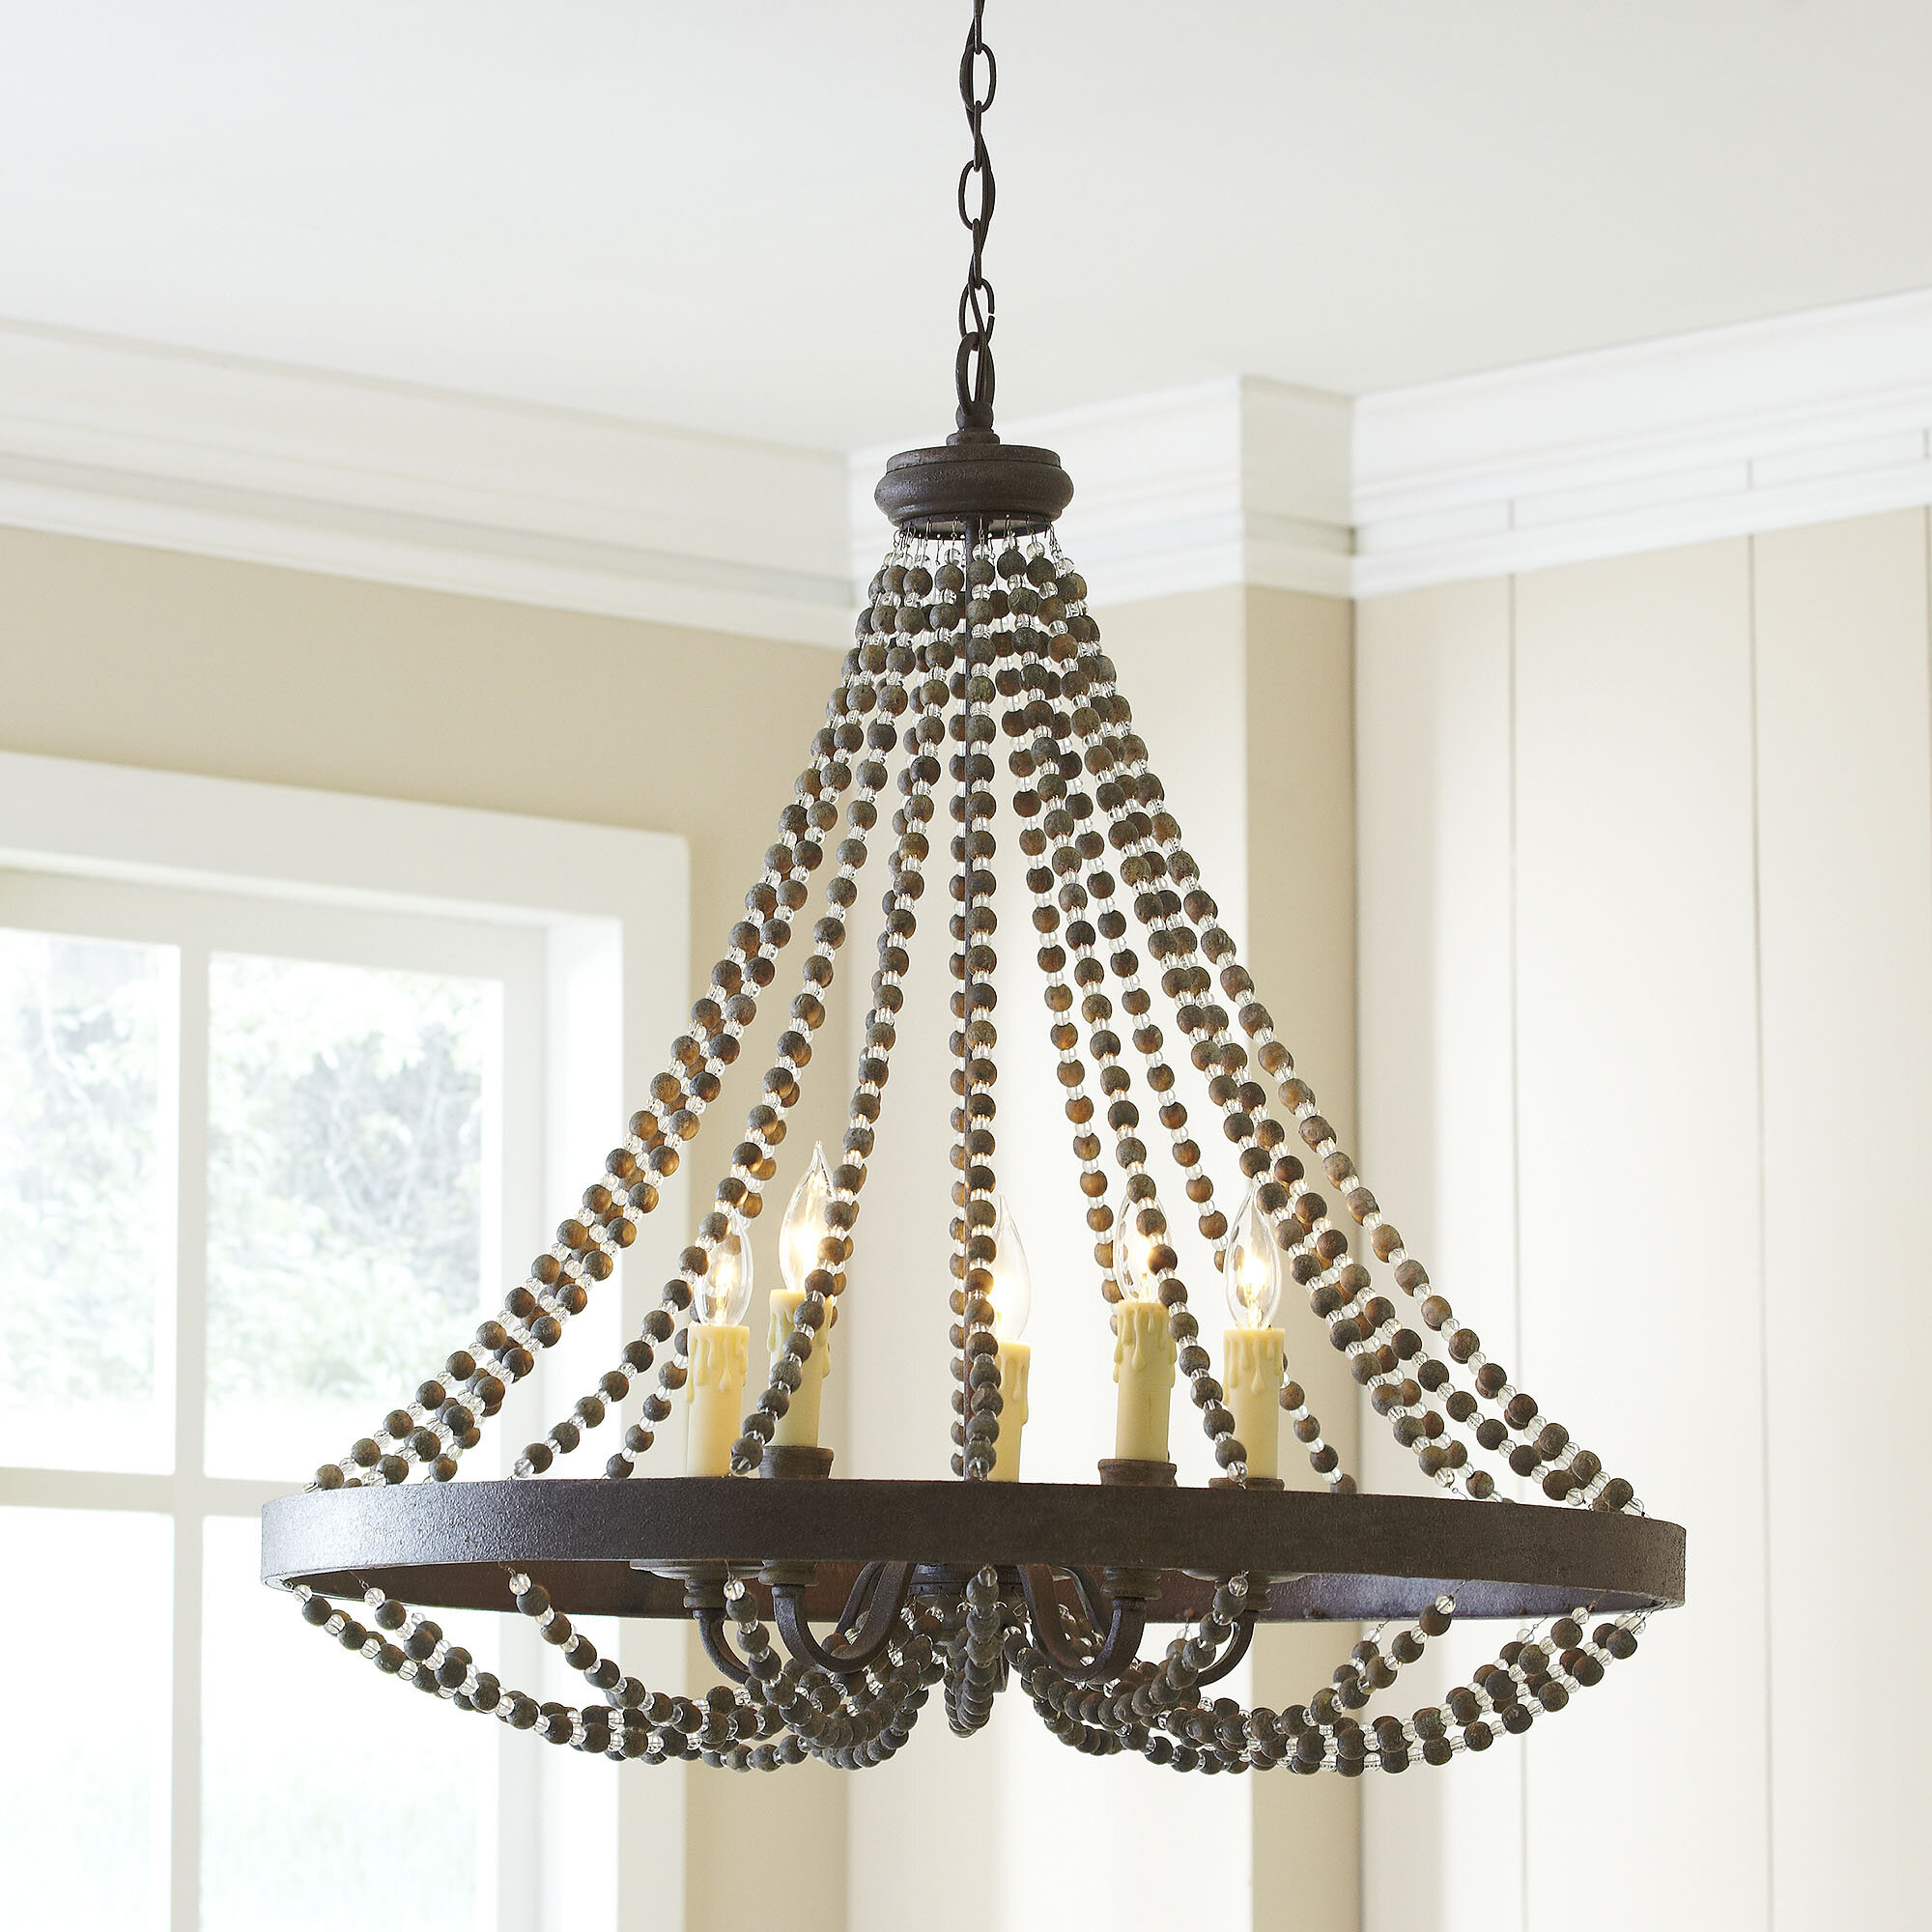 mason wooden pottery barn full bead drop wood rectangular chandelier me size foodjoy glass elena page jar